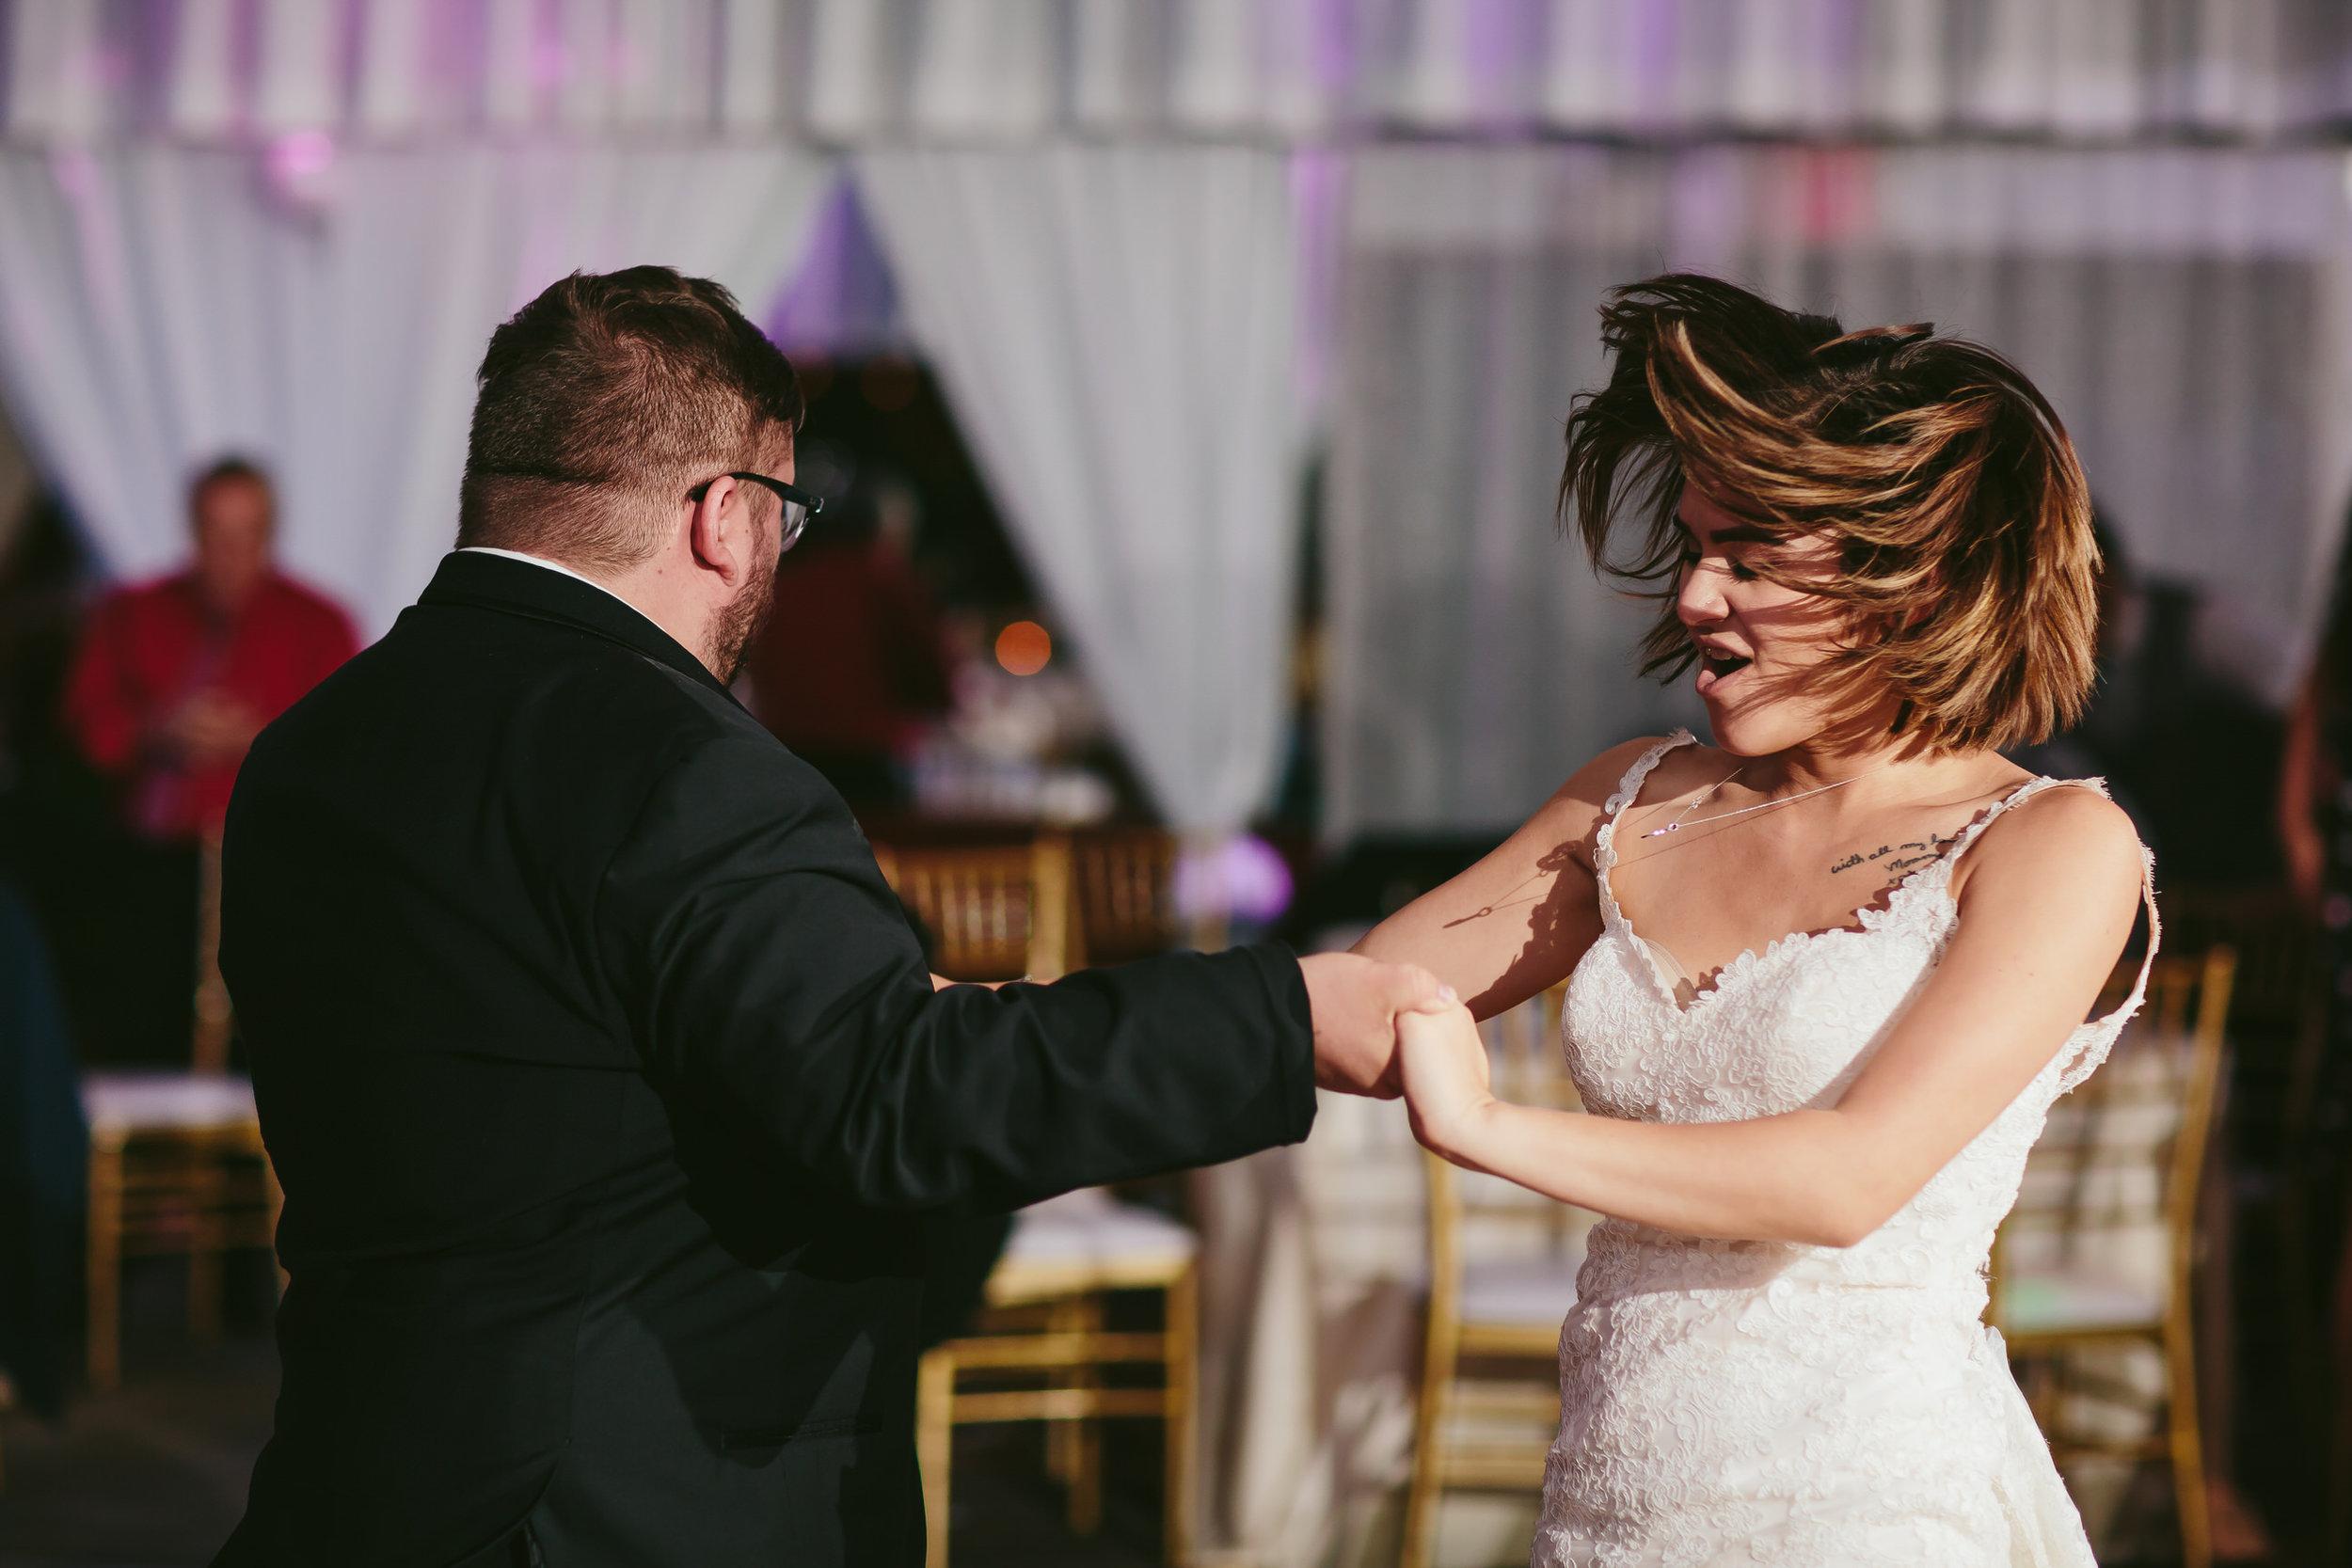 dancing_the_night_away_tiny_house_photo_weddings.jpg